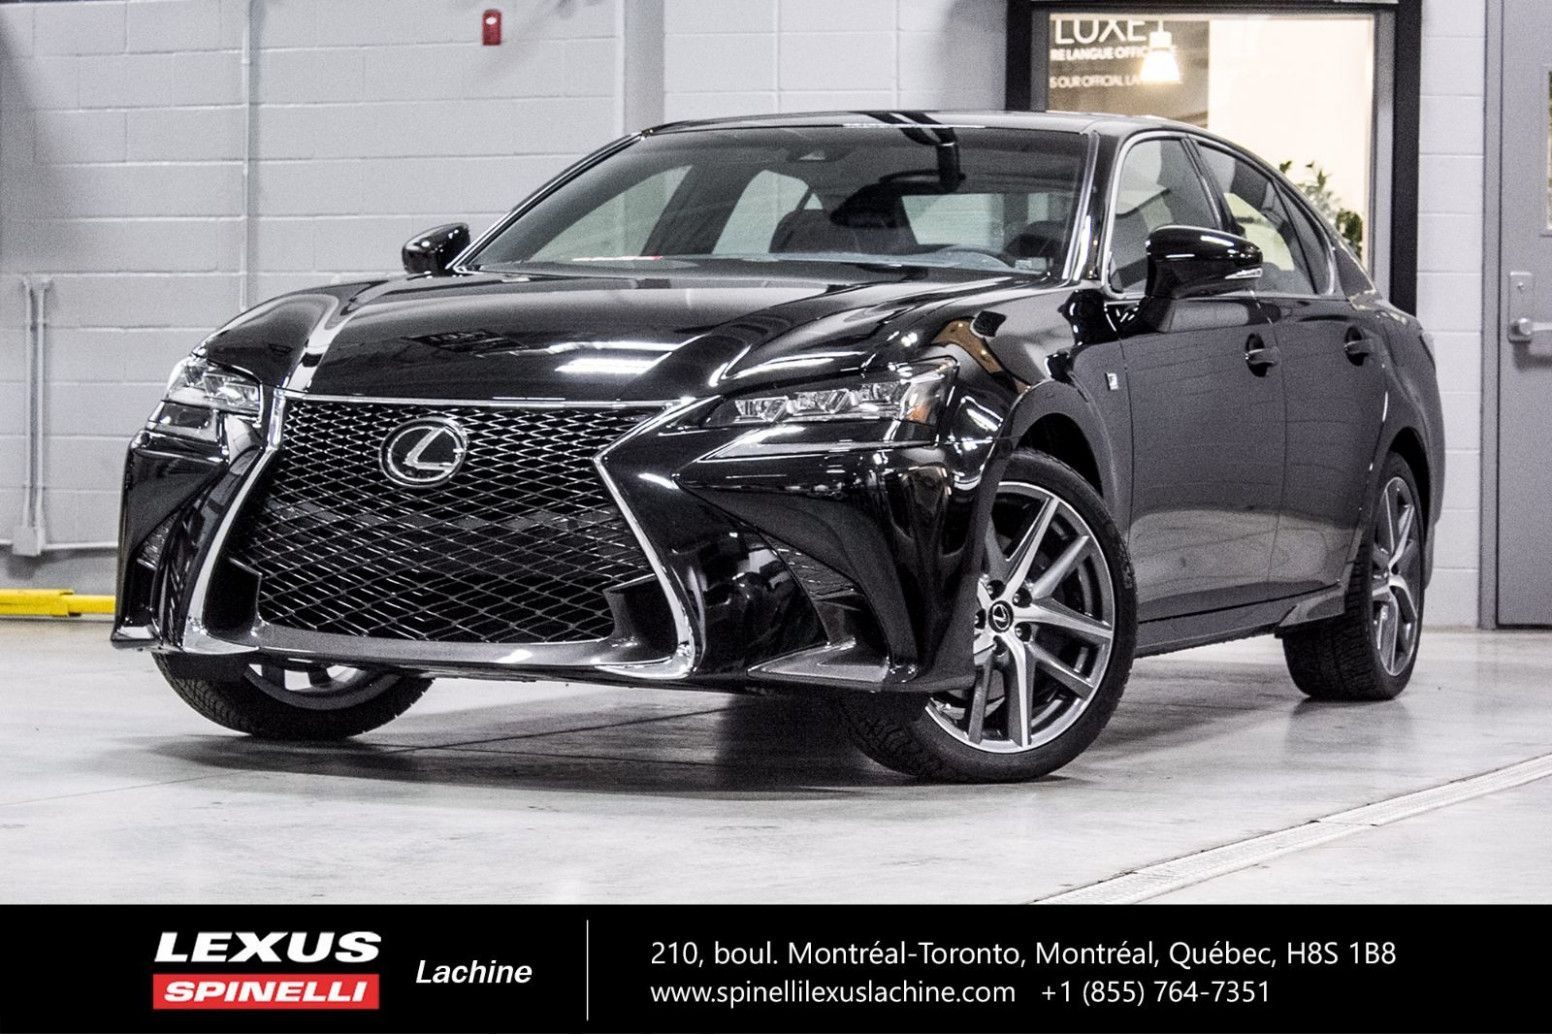 2018 Lexus Gs 350 F Sport For Sale Redesign 2018lexusgs350fsportawdforsale 2018lexusgs350fsportforsale 2018lexusgs350fsportf Lexus Lexus Es Best Gas Mileage